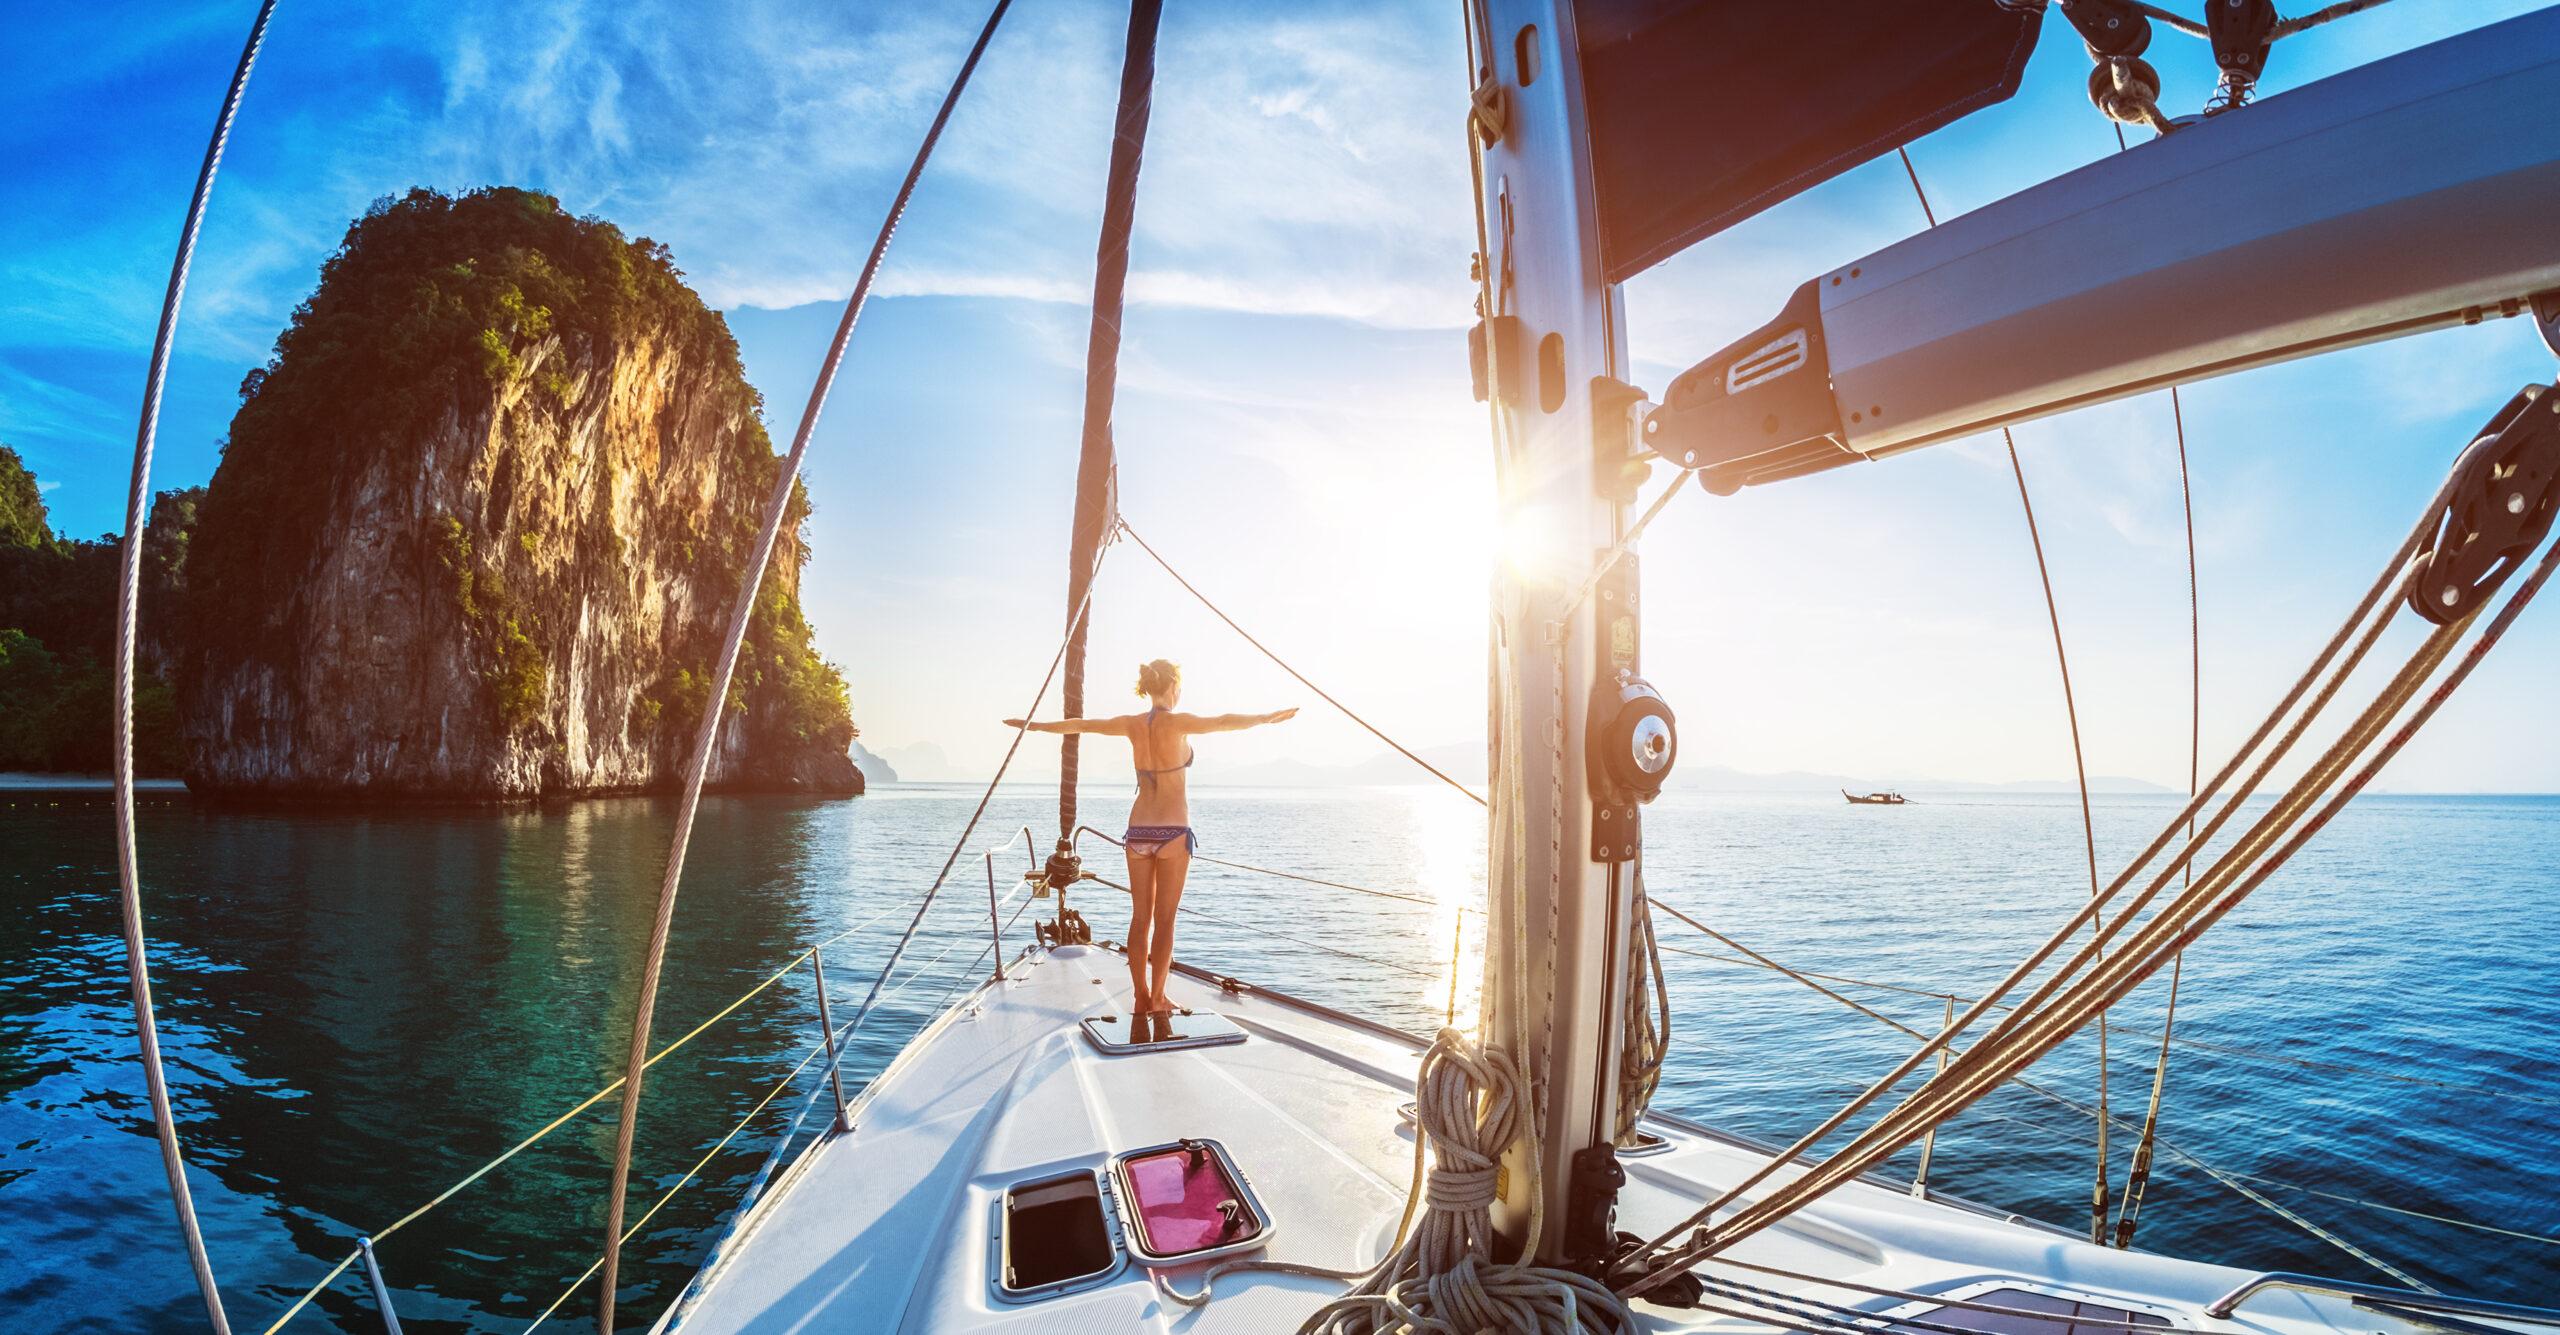 traveller on yacht